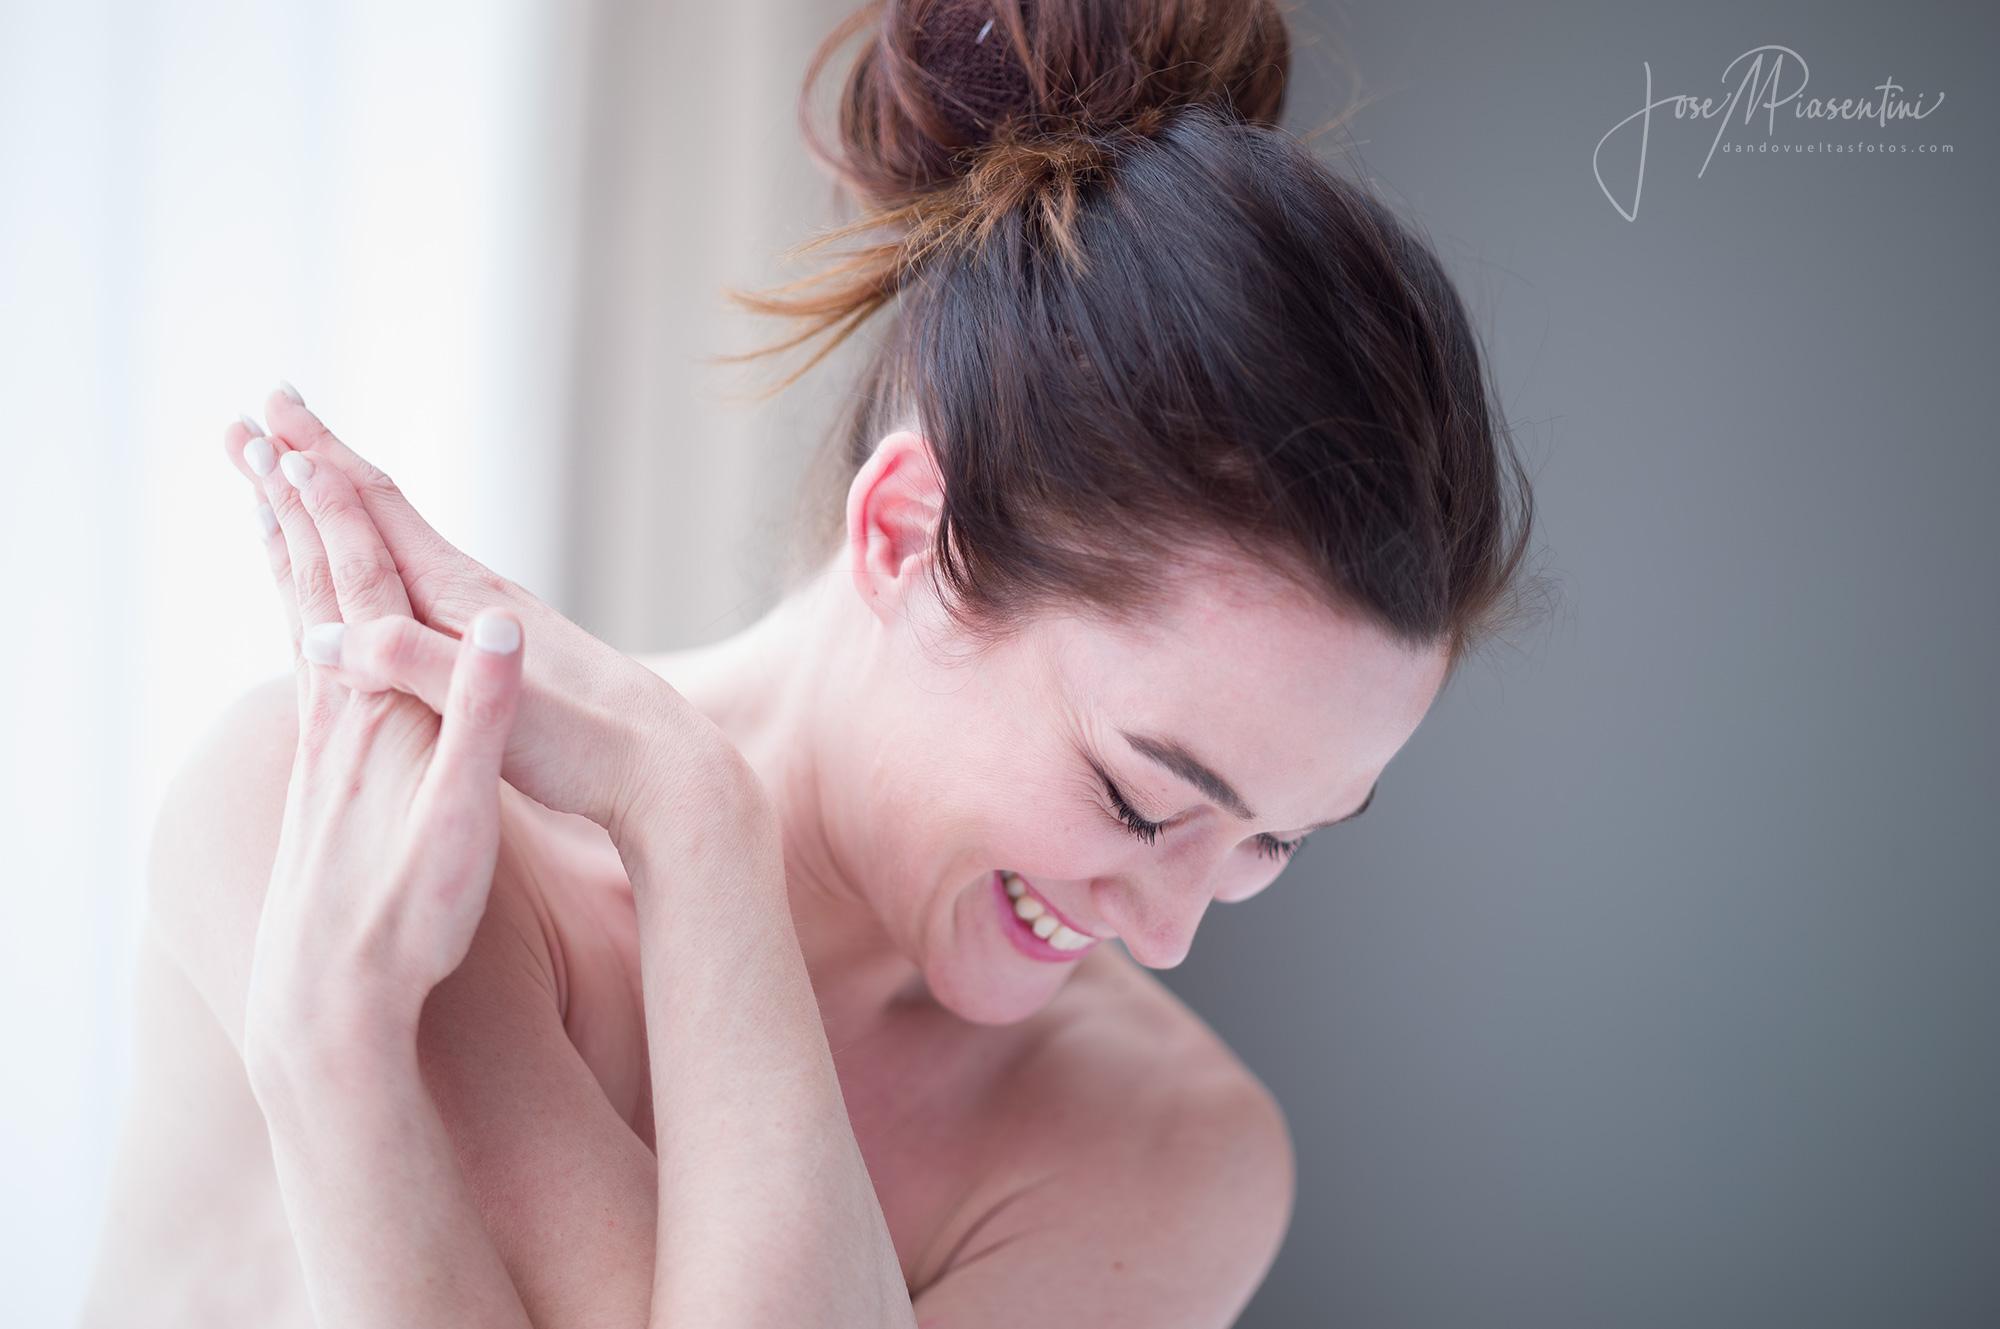 C.BOHO modelo especialista en desnudo artístico